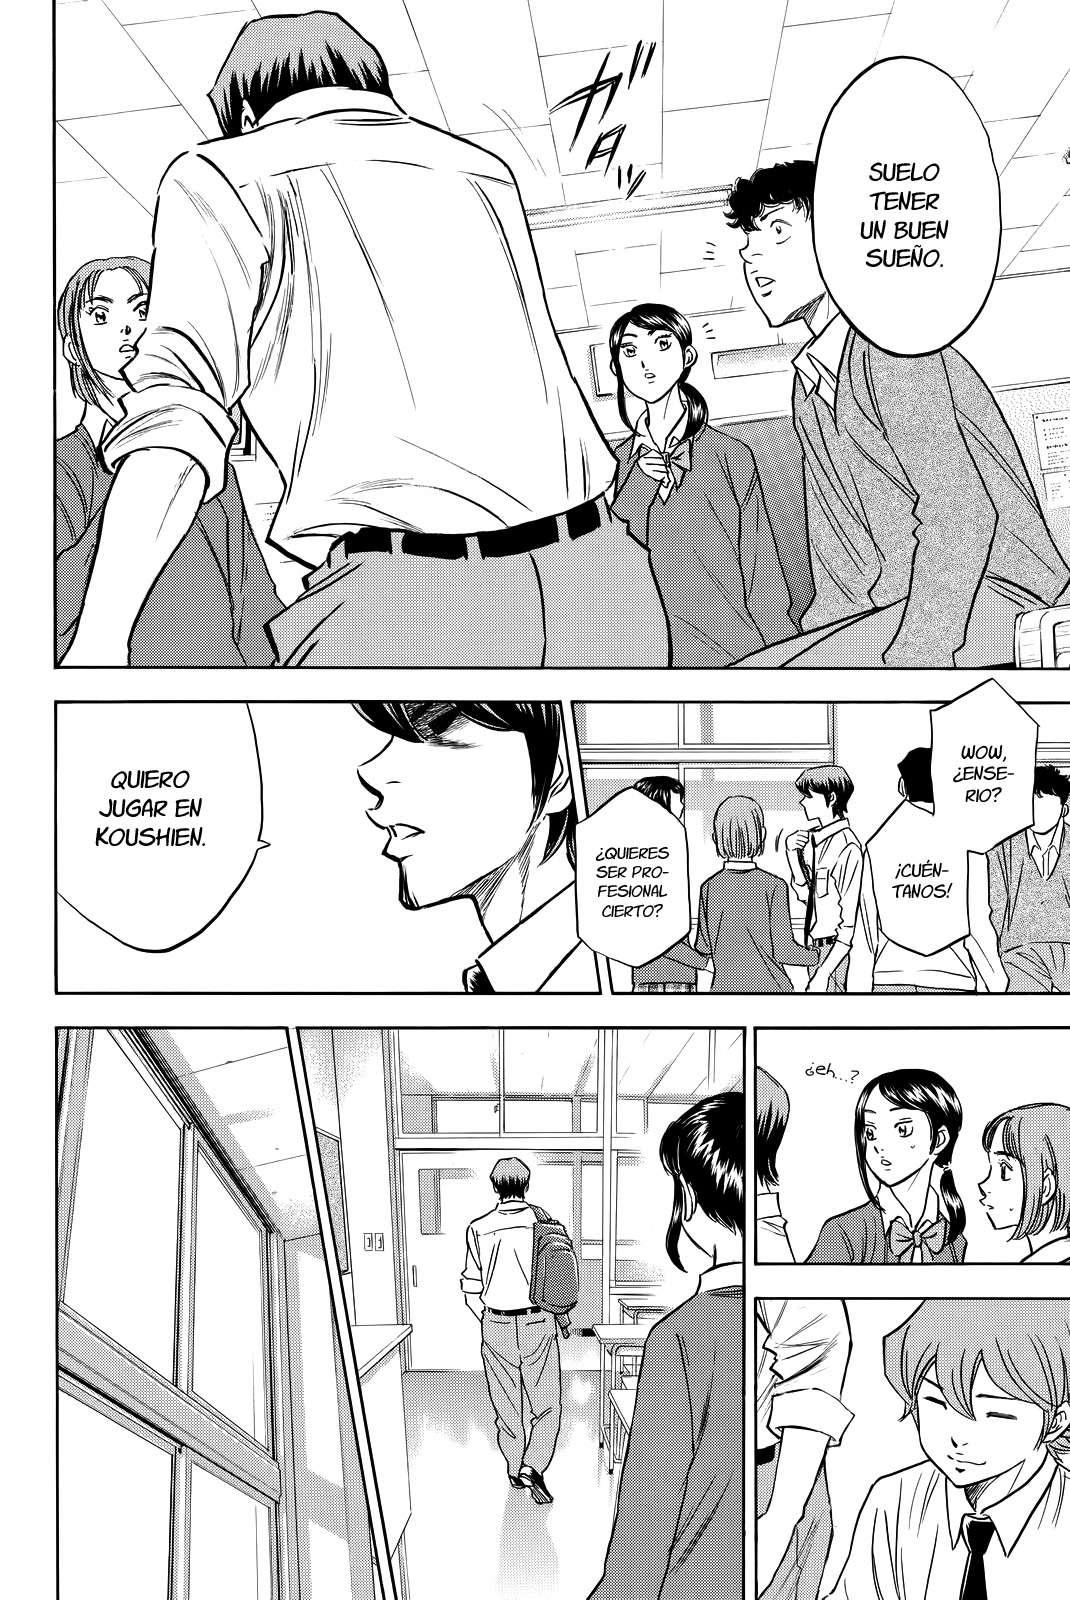 http://c5.ninemanga.com/es_manga/24/1752/422720/39f17b08bc22bba8afa2792d4089de92.jpg Page 9